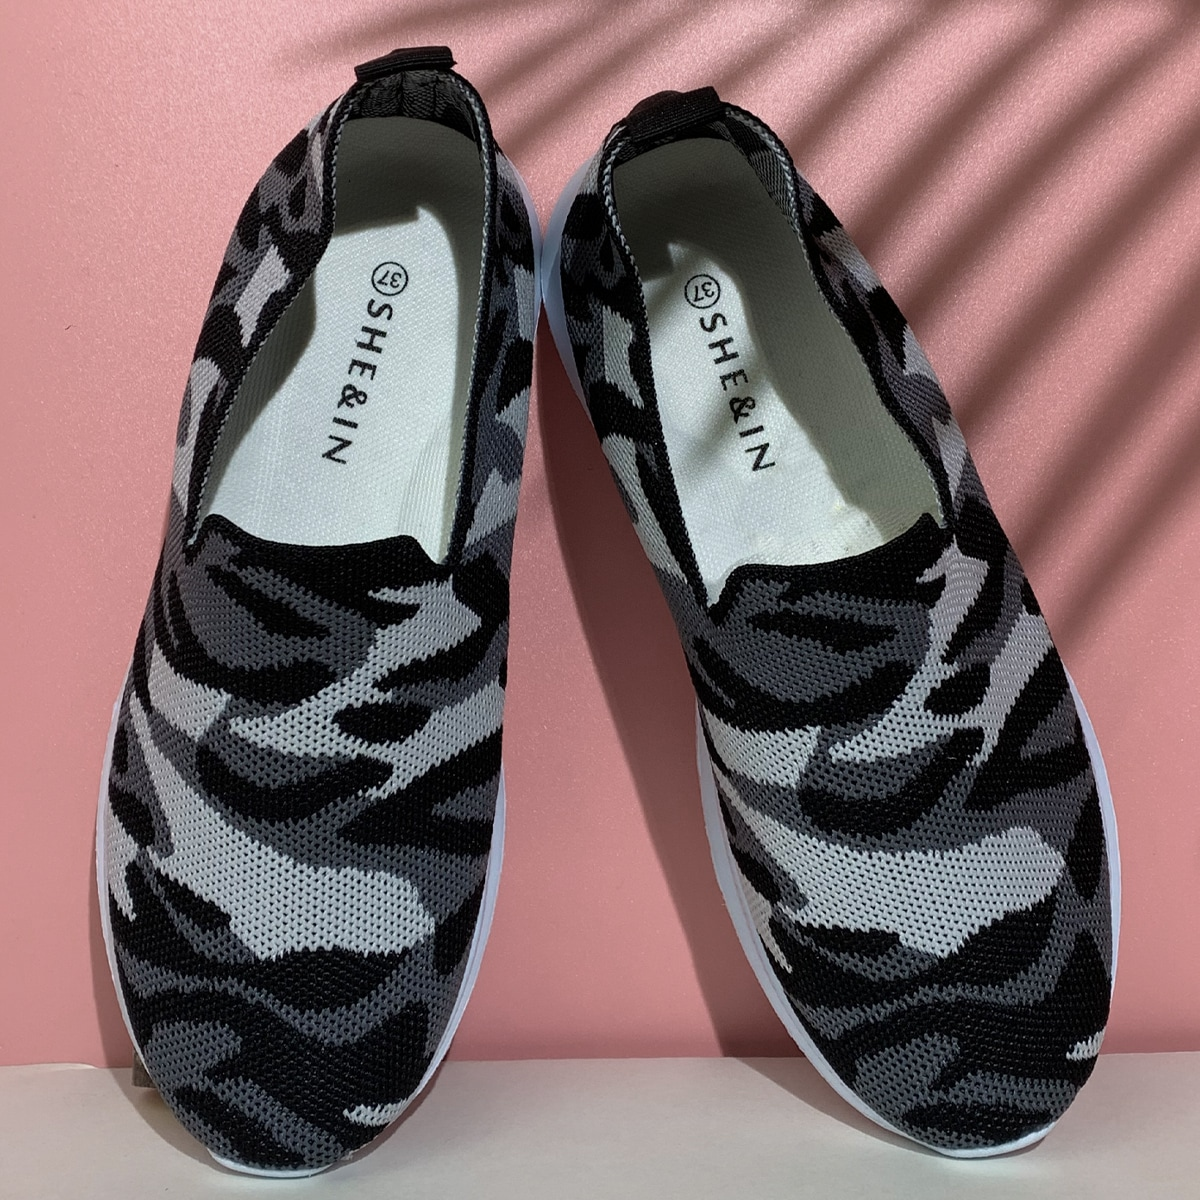 shein Camouflage Sneaker